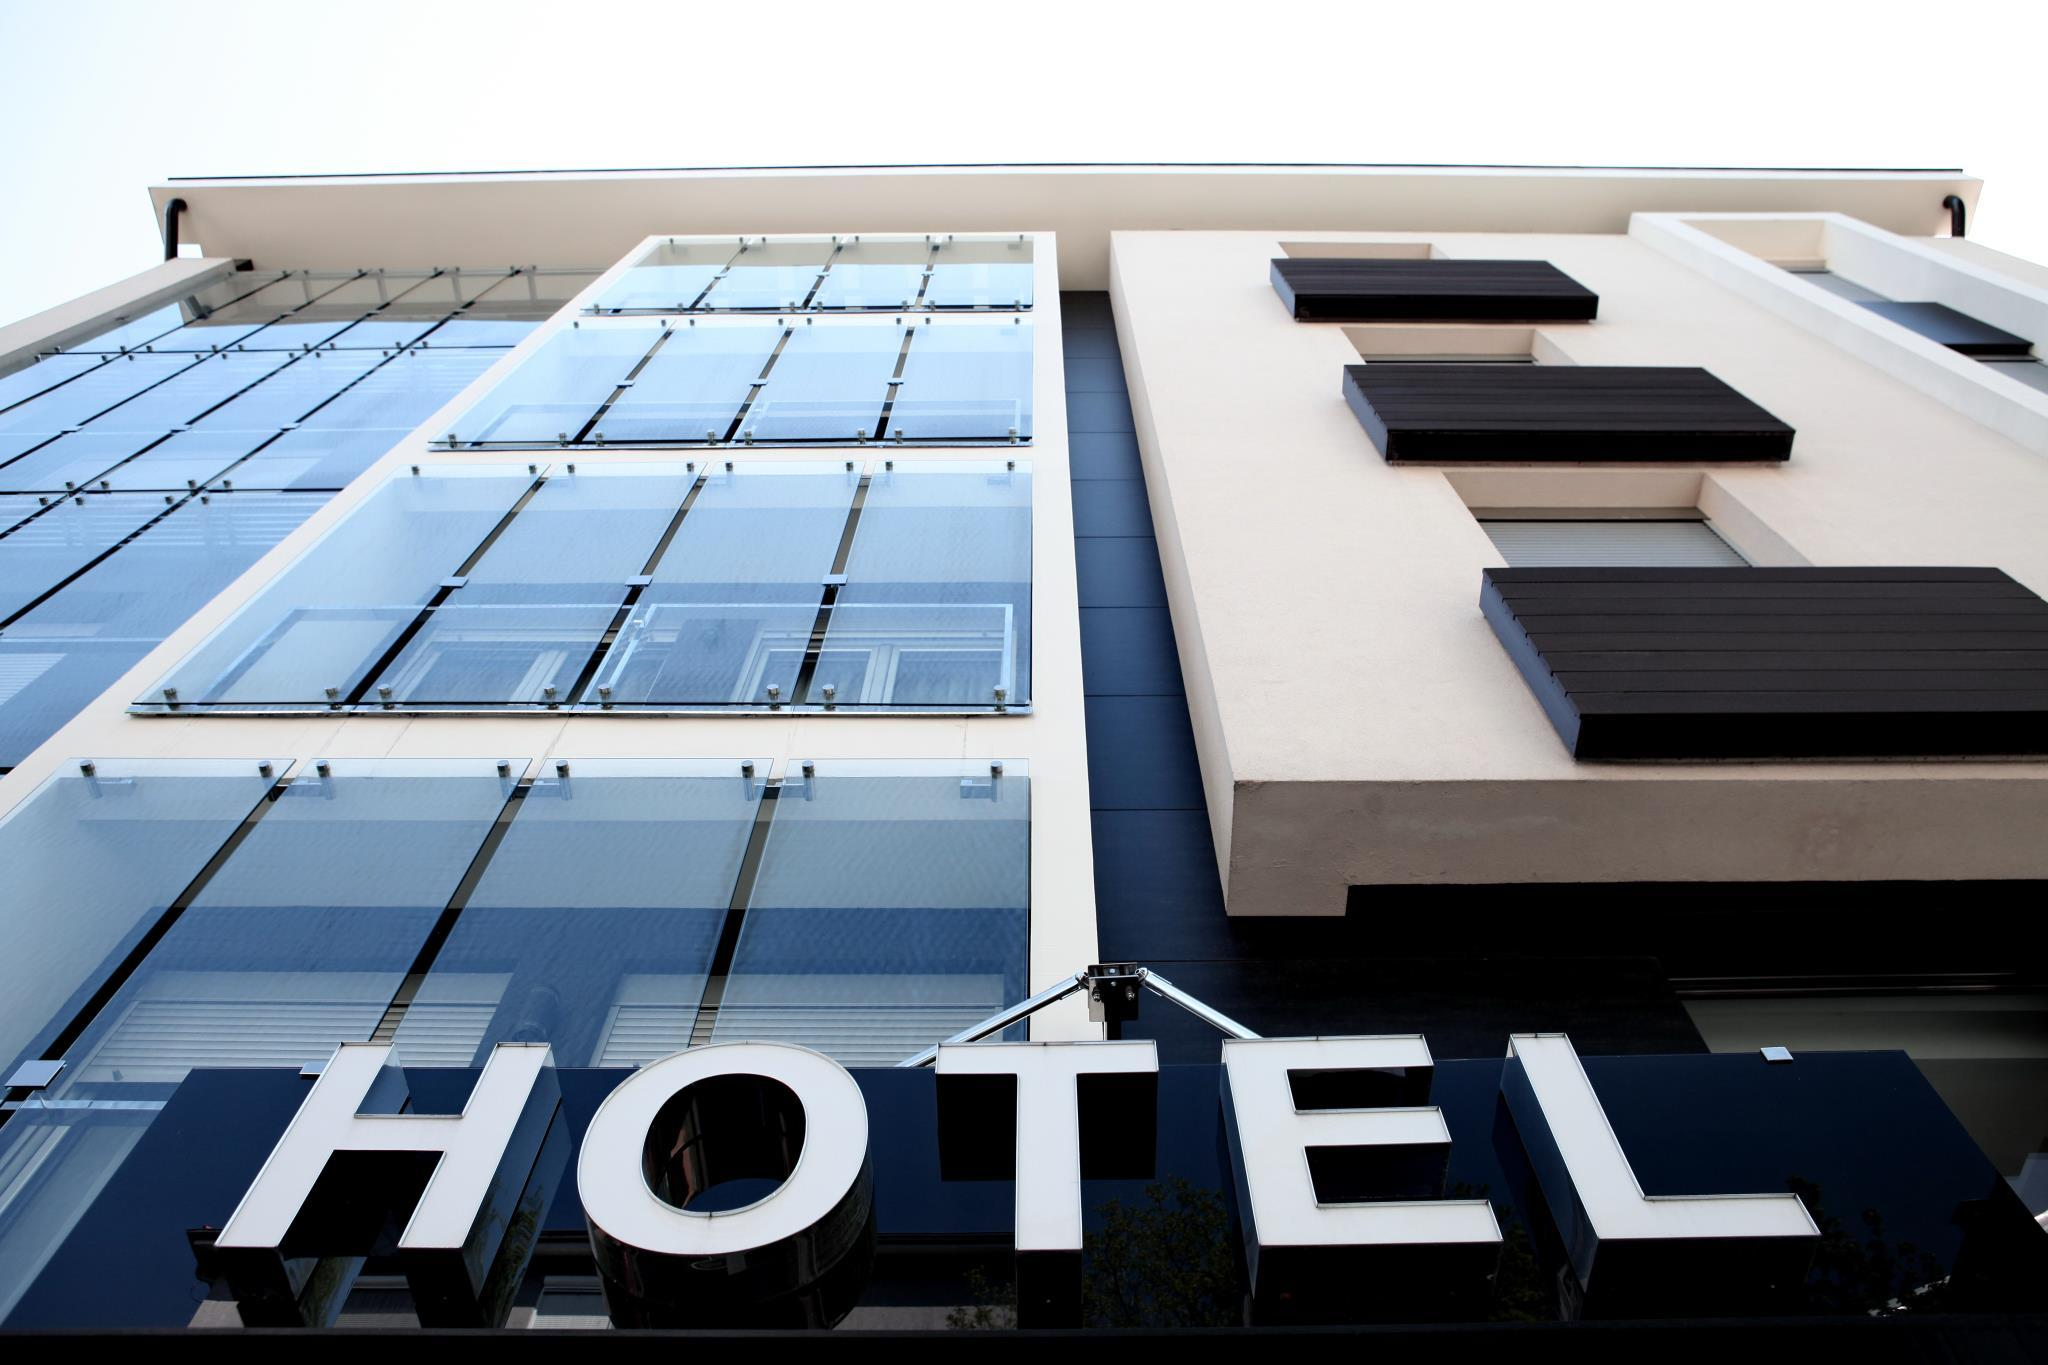 Nova City Hotel Signature Collection Belgrade